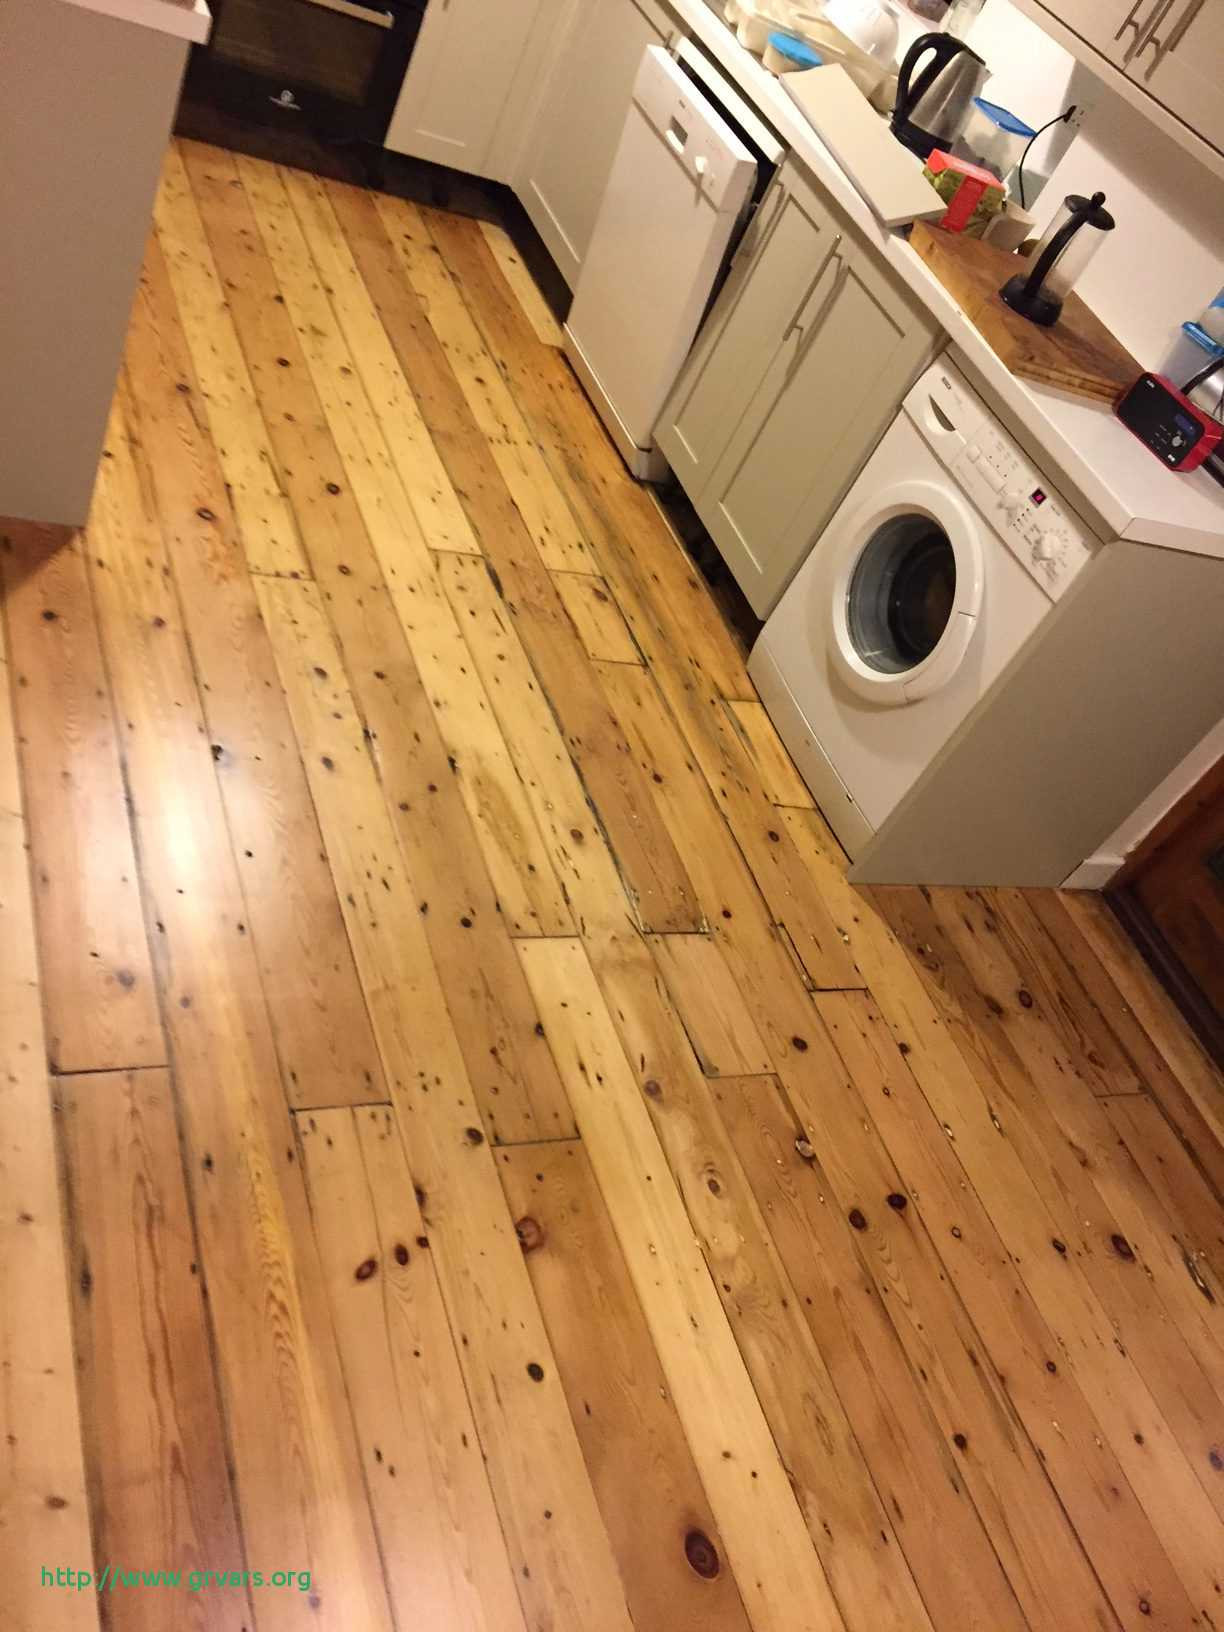 hardwood floor restoration chicago of 15 charmant how to seal a hardwood floor ideas blog regarding how to seal a hardwood floor beau gallery priory wood floor restoration